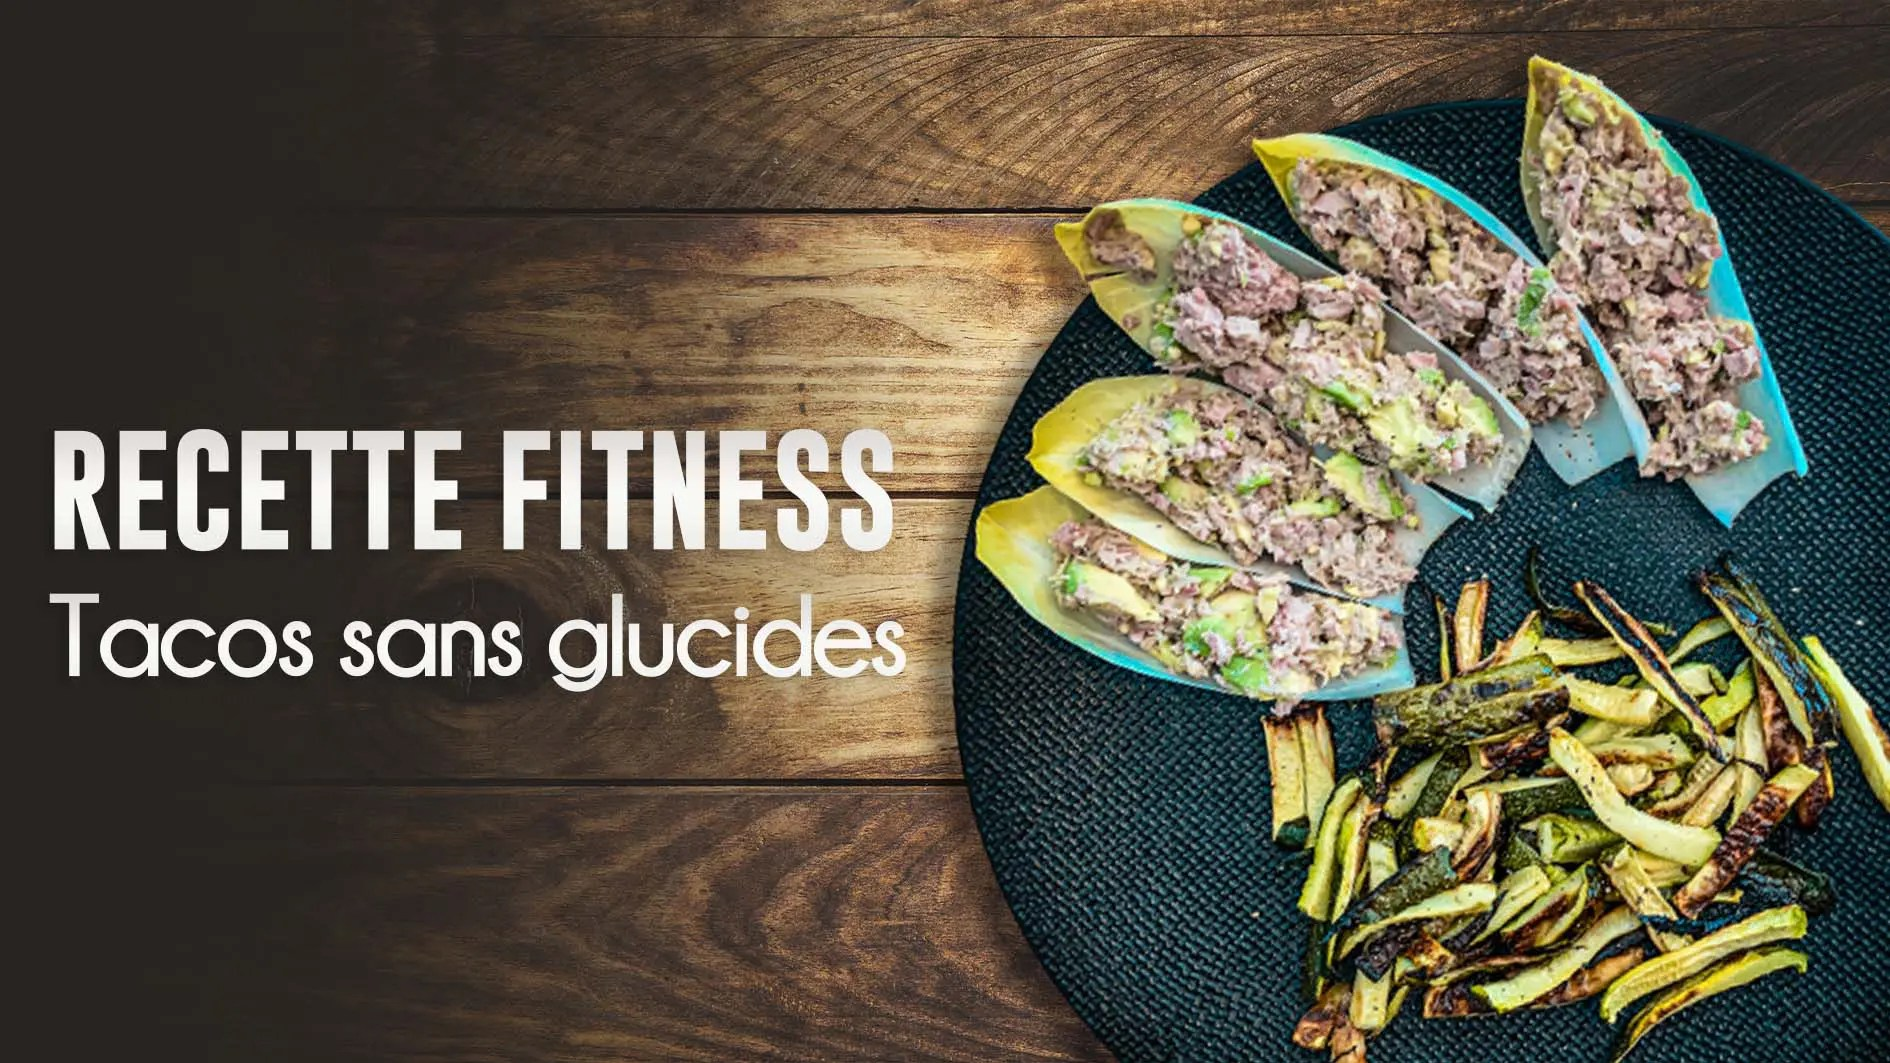 Recette fitness : tacos sans glucides